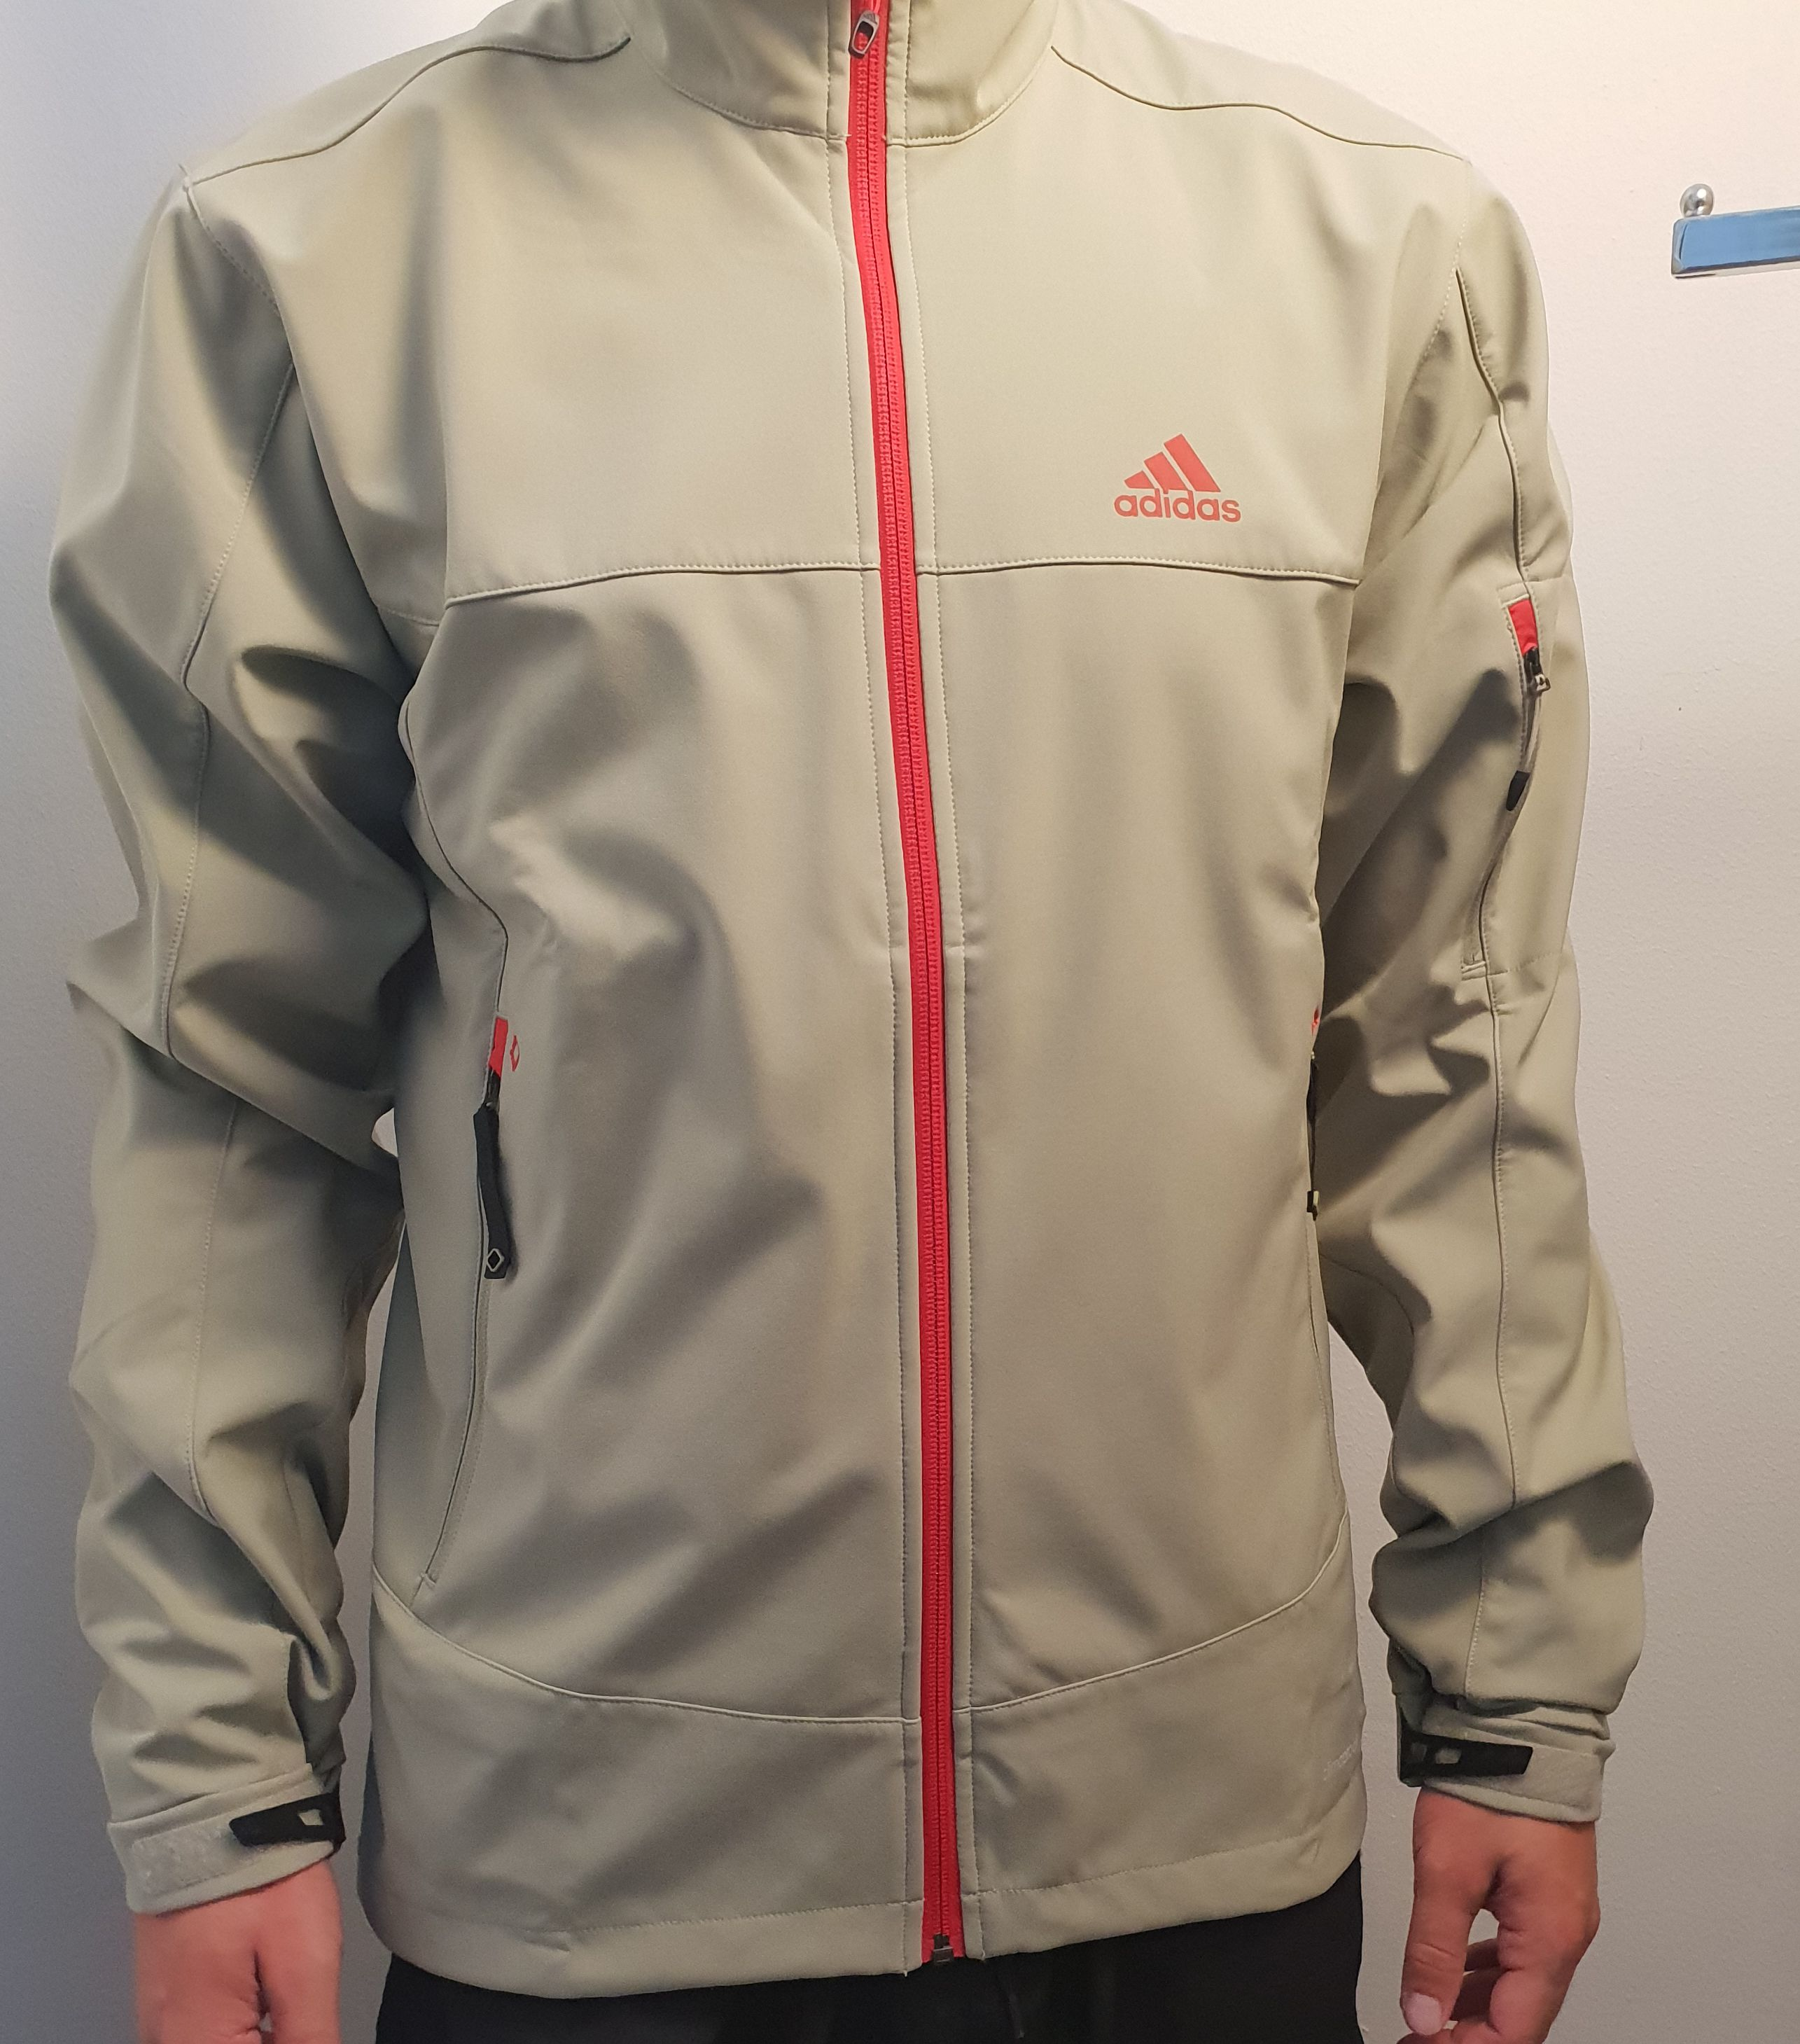 Adidas Men's Ht Softshell Jacket Tech Beige